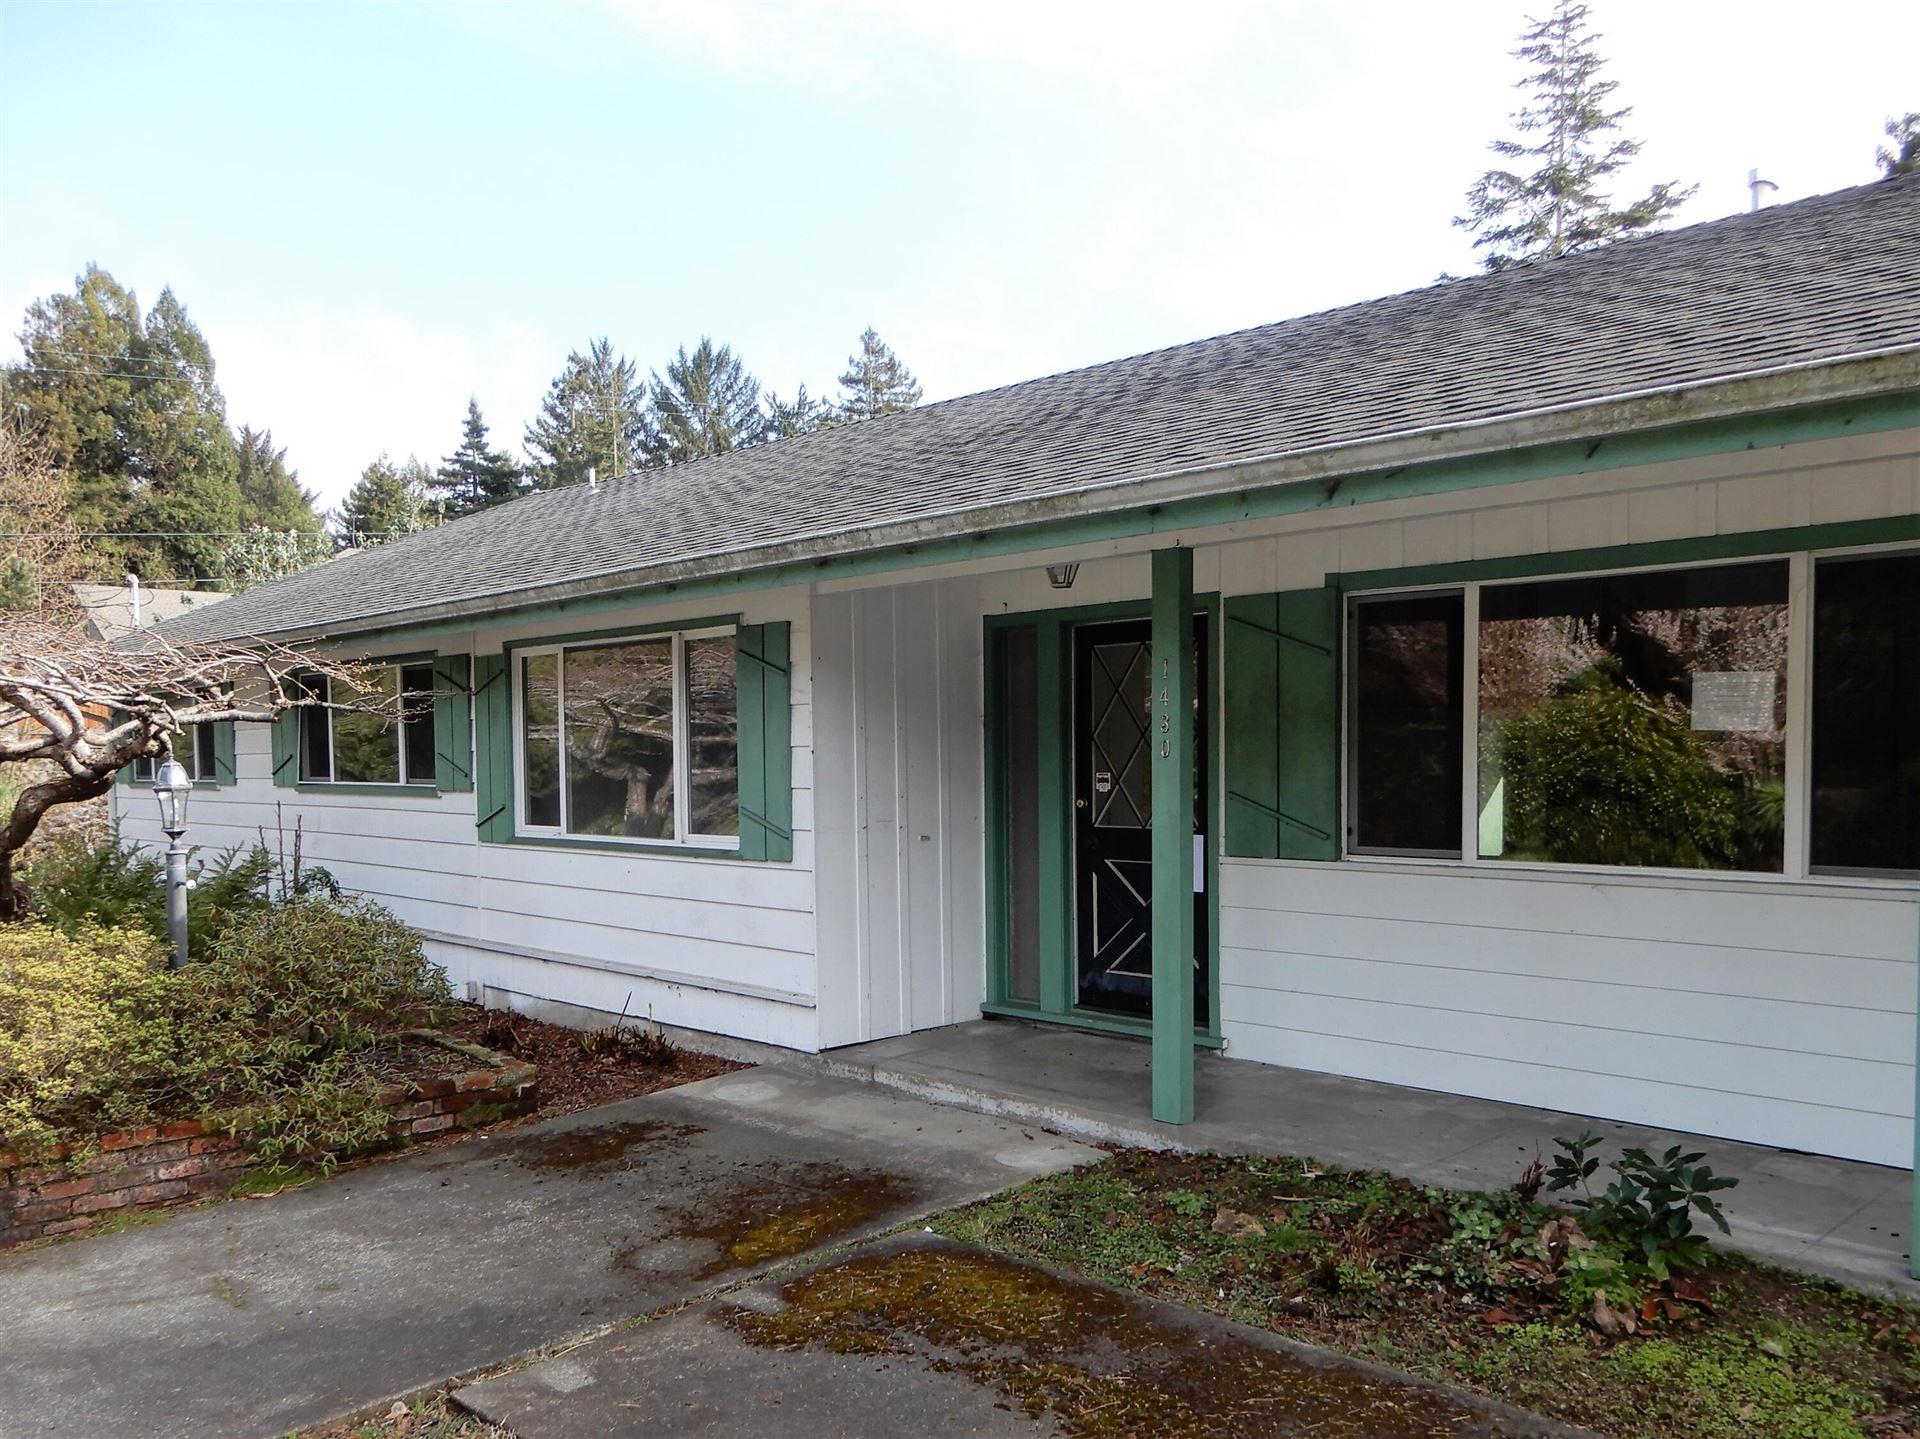 1430 Buhne Street, Eureka, CA 95501 - MLS#: 258916